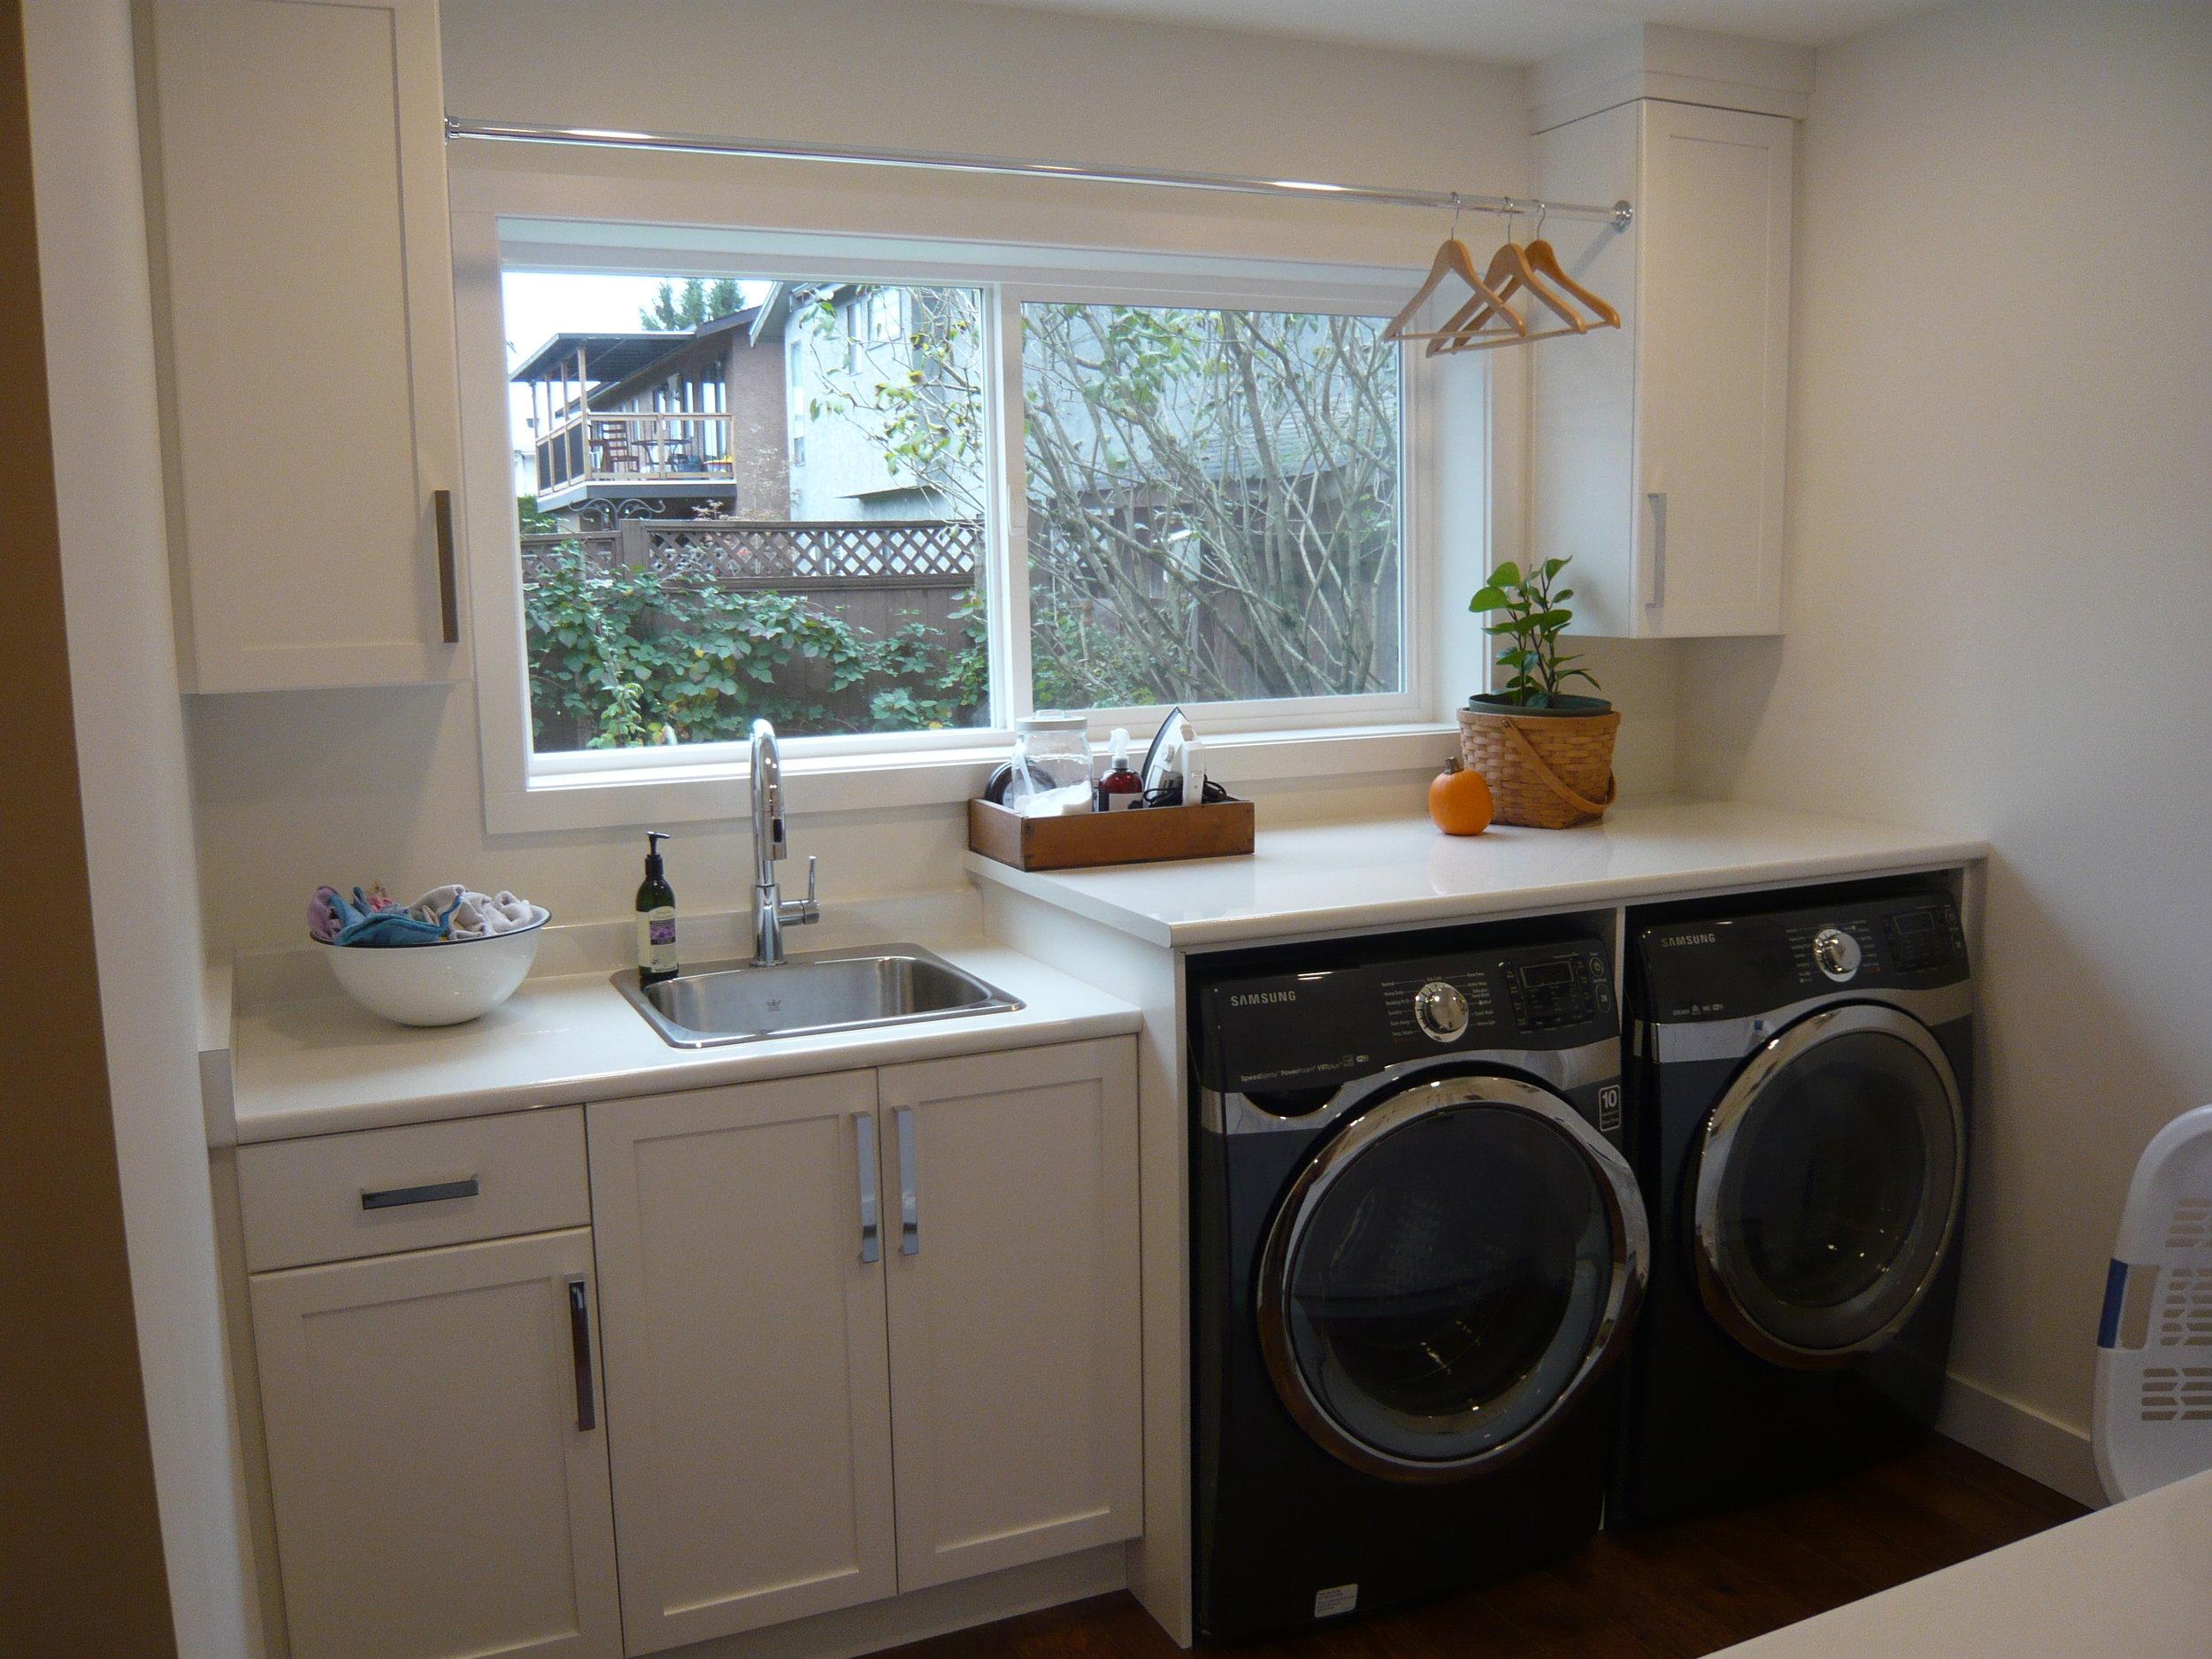 Photo Credit: Scotwend Homes Ltd.